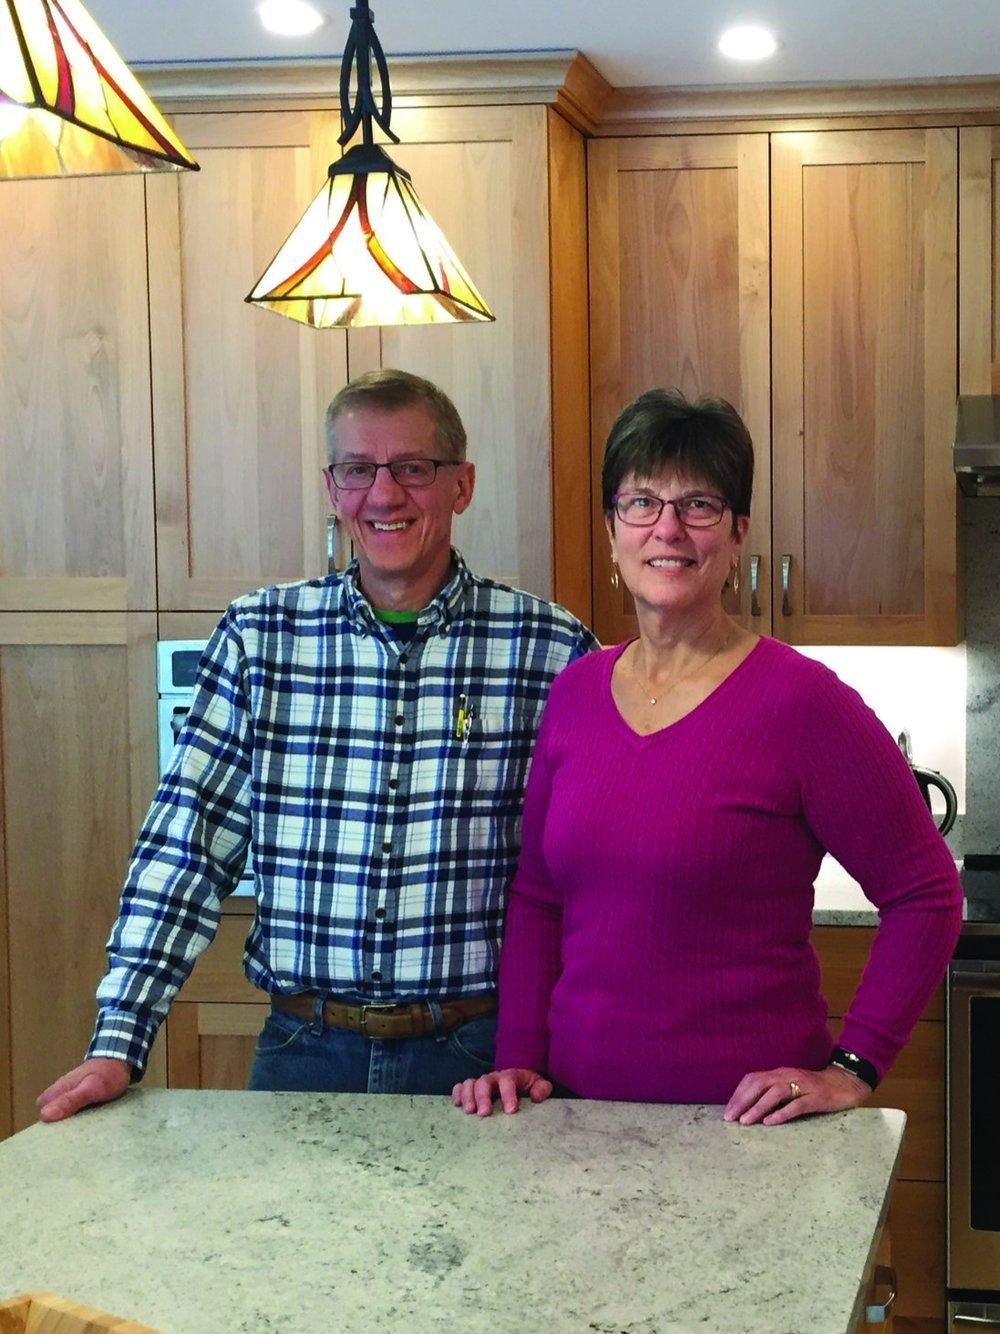 Homeowners, Steve and Cheryl Martin.